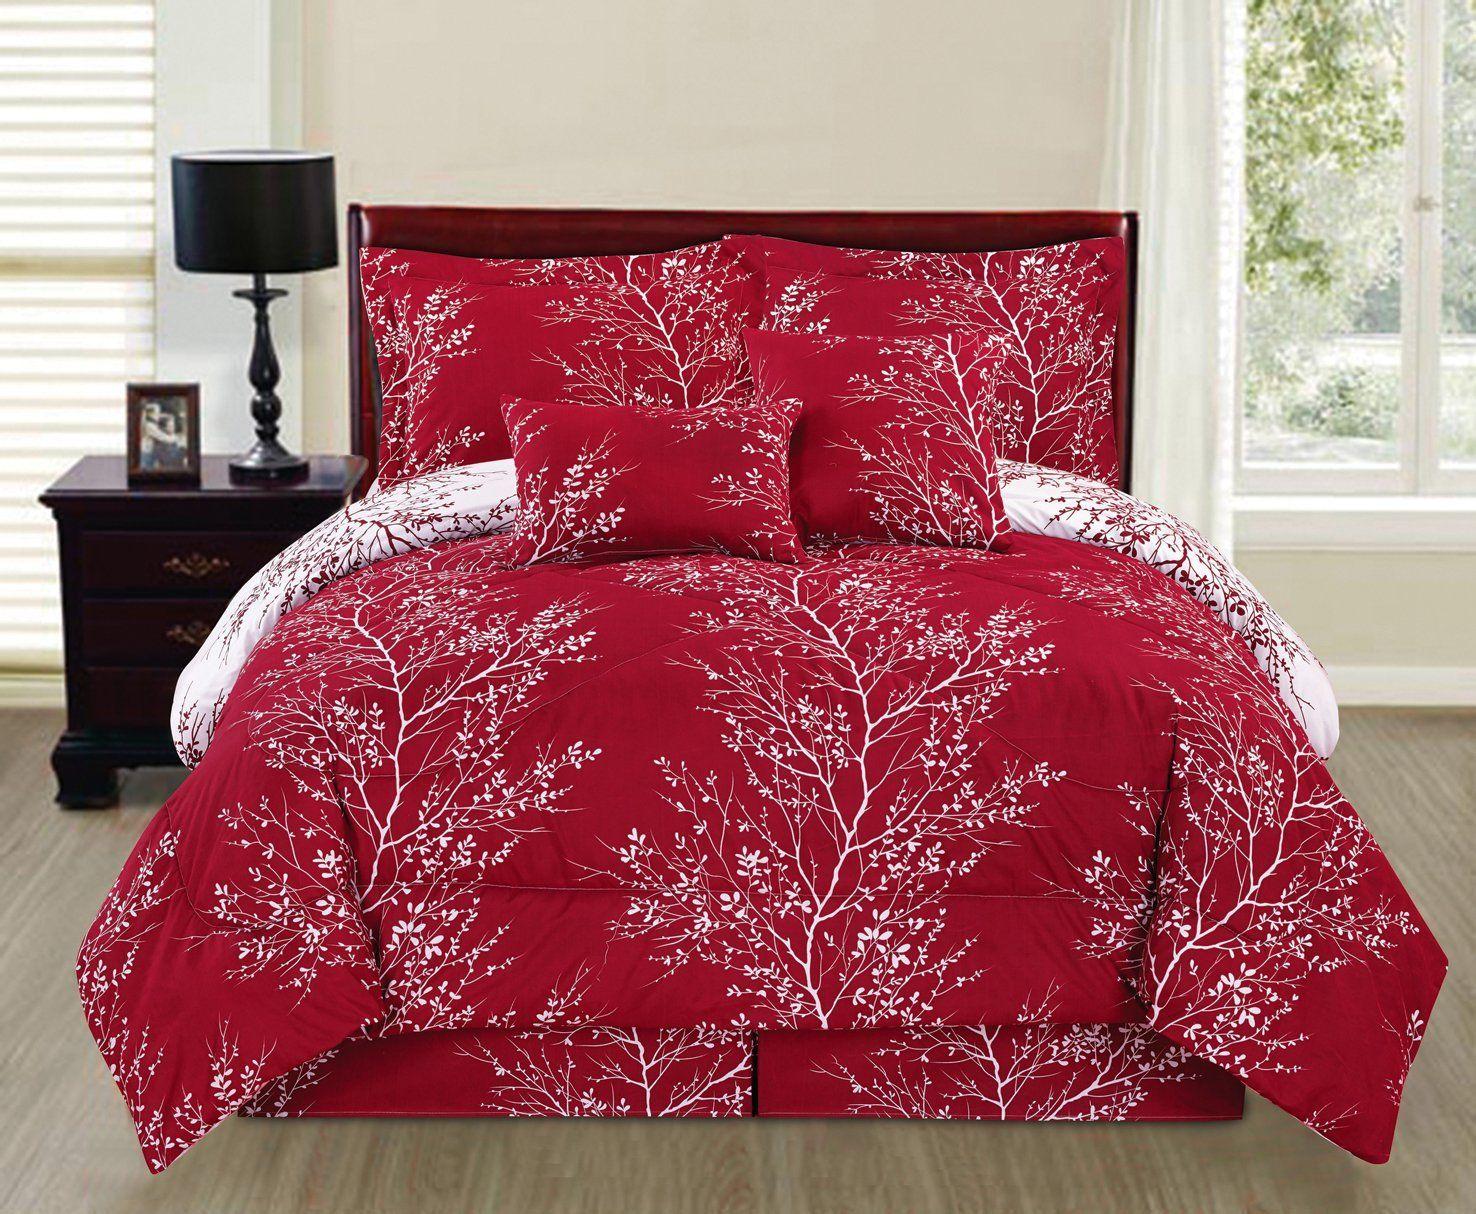 Khaki Bedding Sets With More Home Comforter Sets